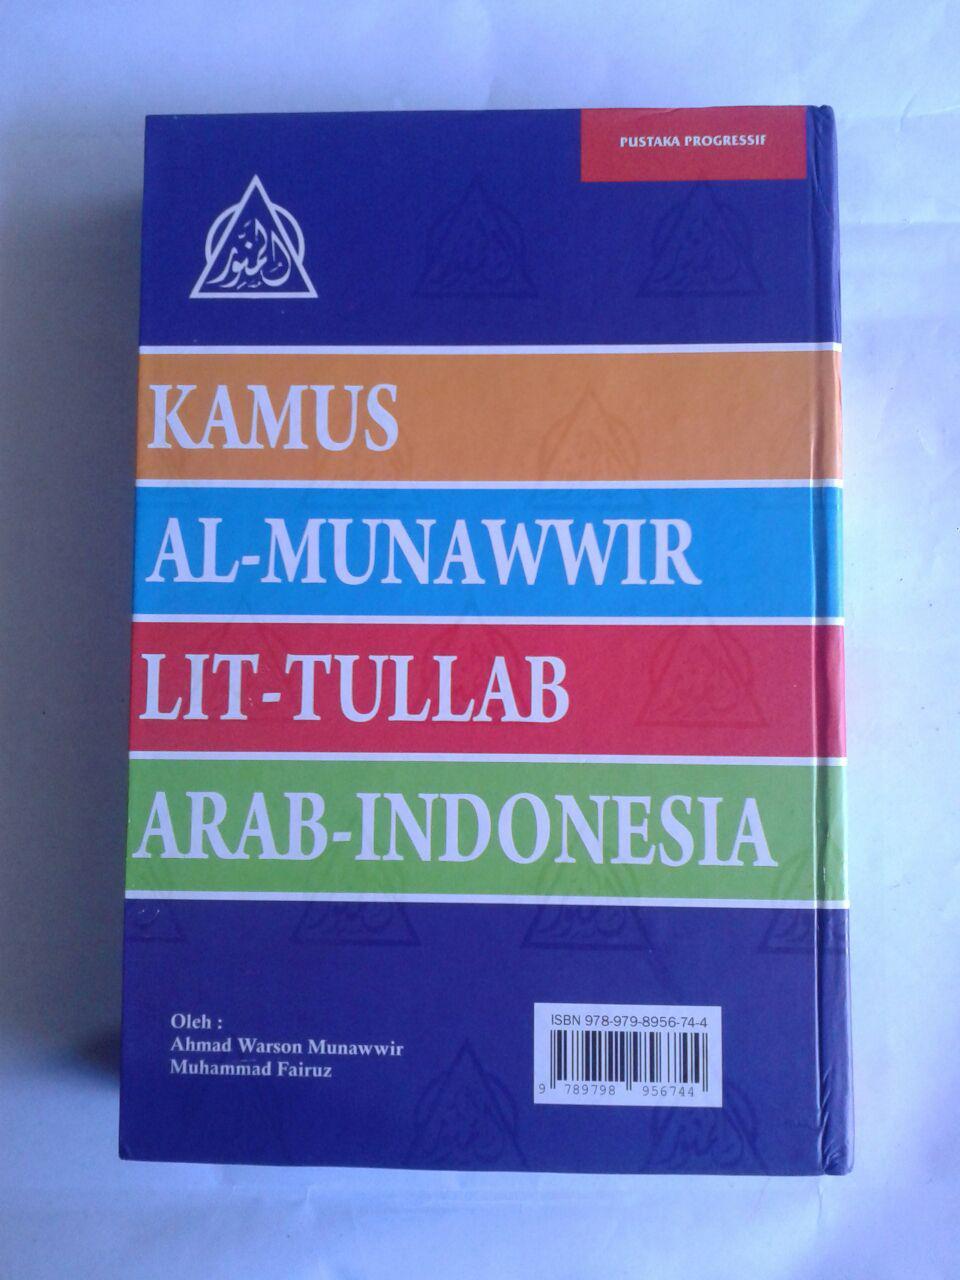 Buku Kamus Al-Munawwir Lit-Tullab Arab-Indonesia cover 2